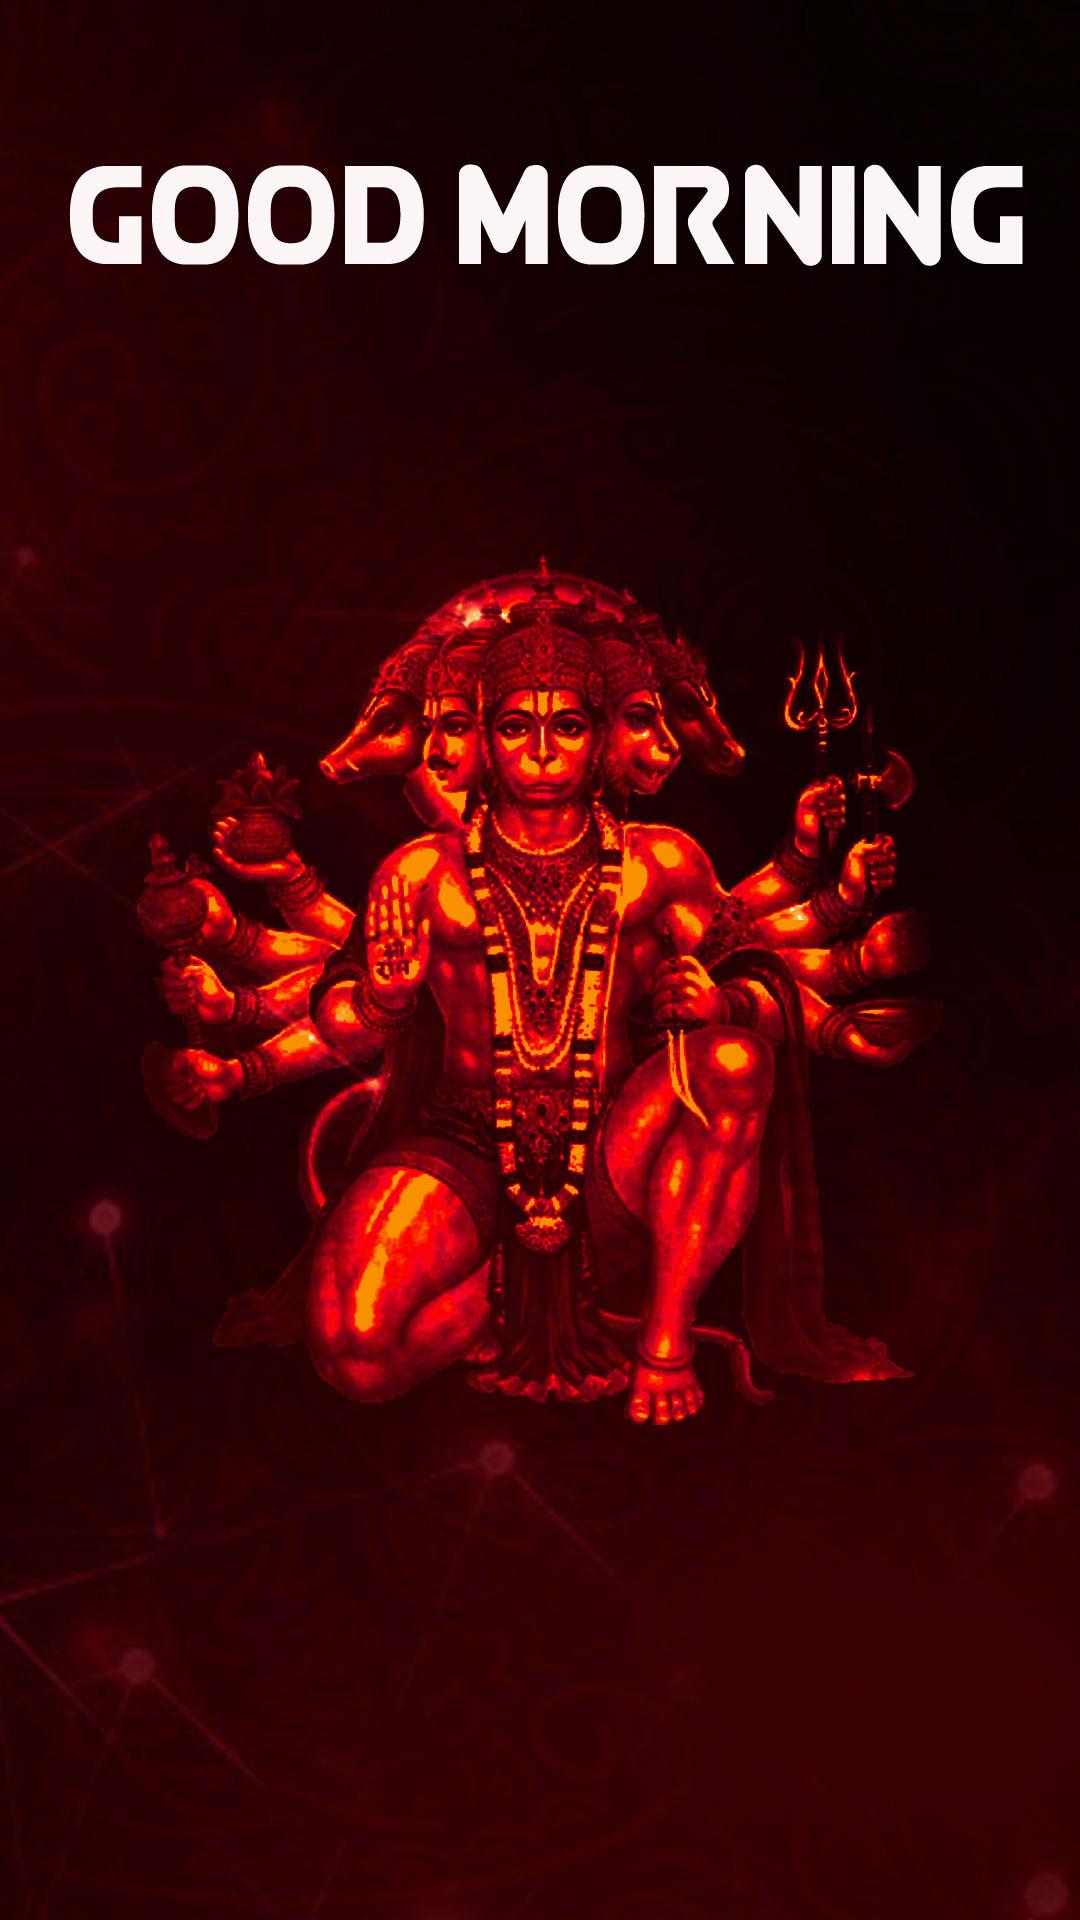 HD New hanuman ji Good Morning Images Download